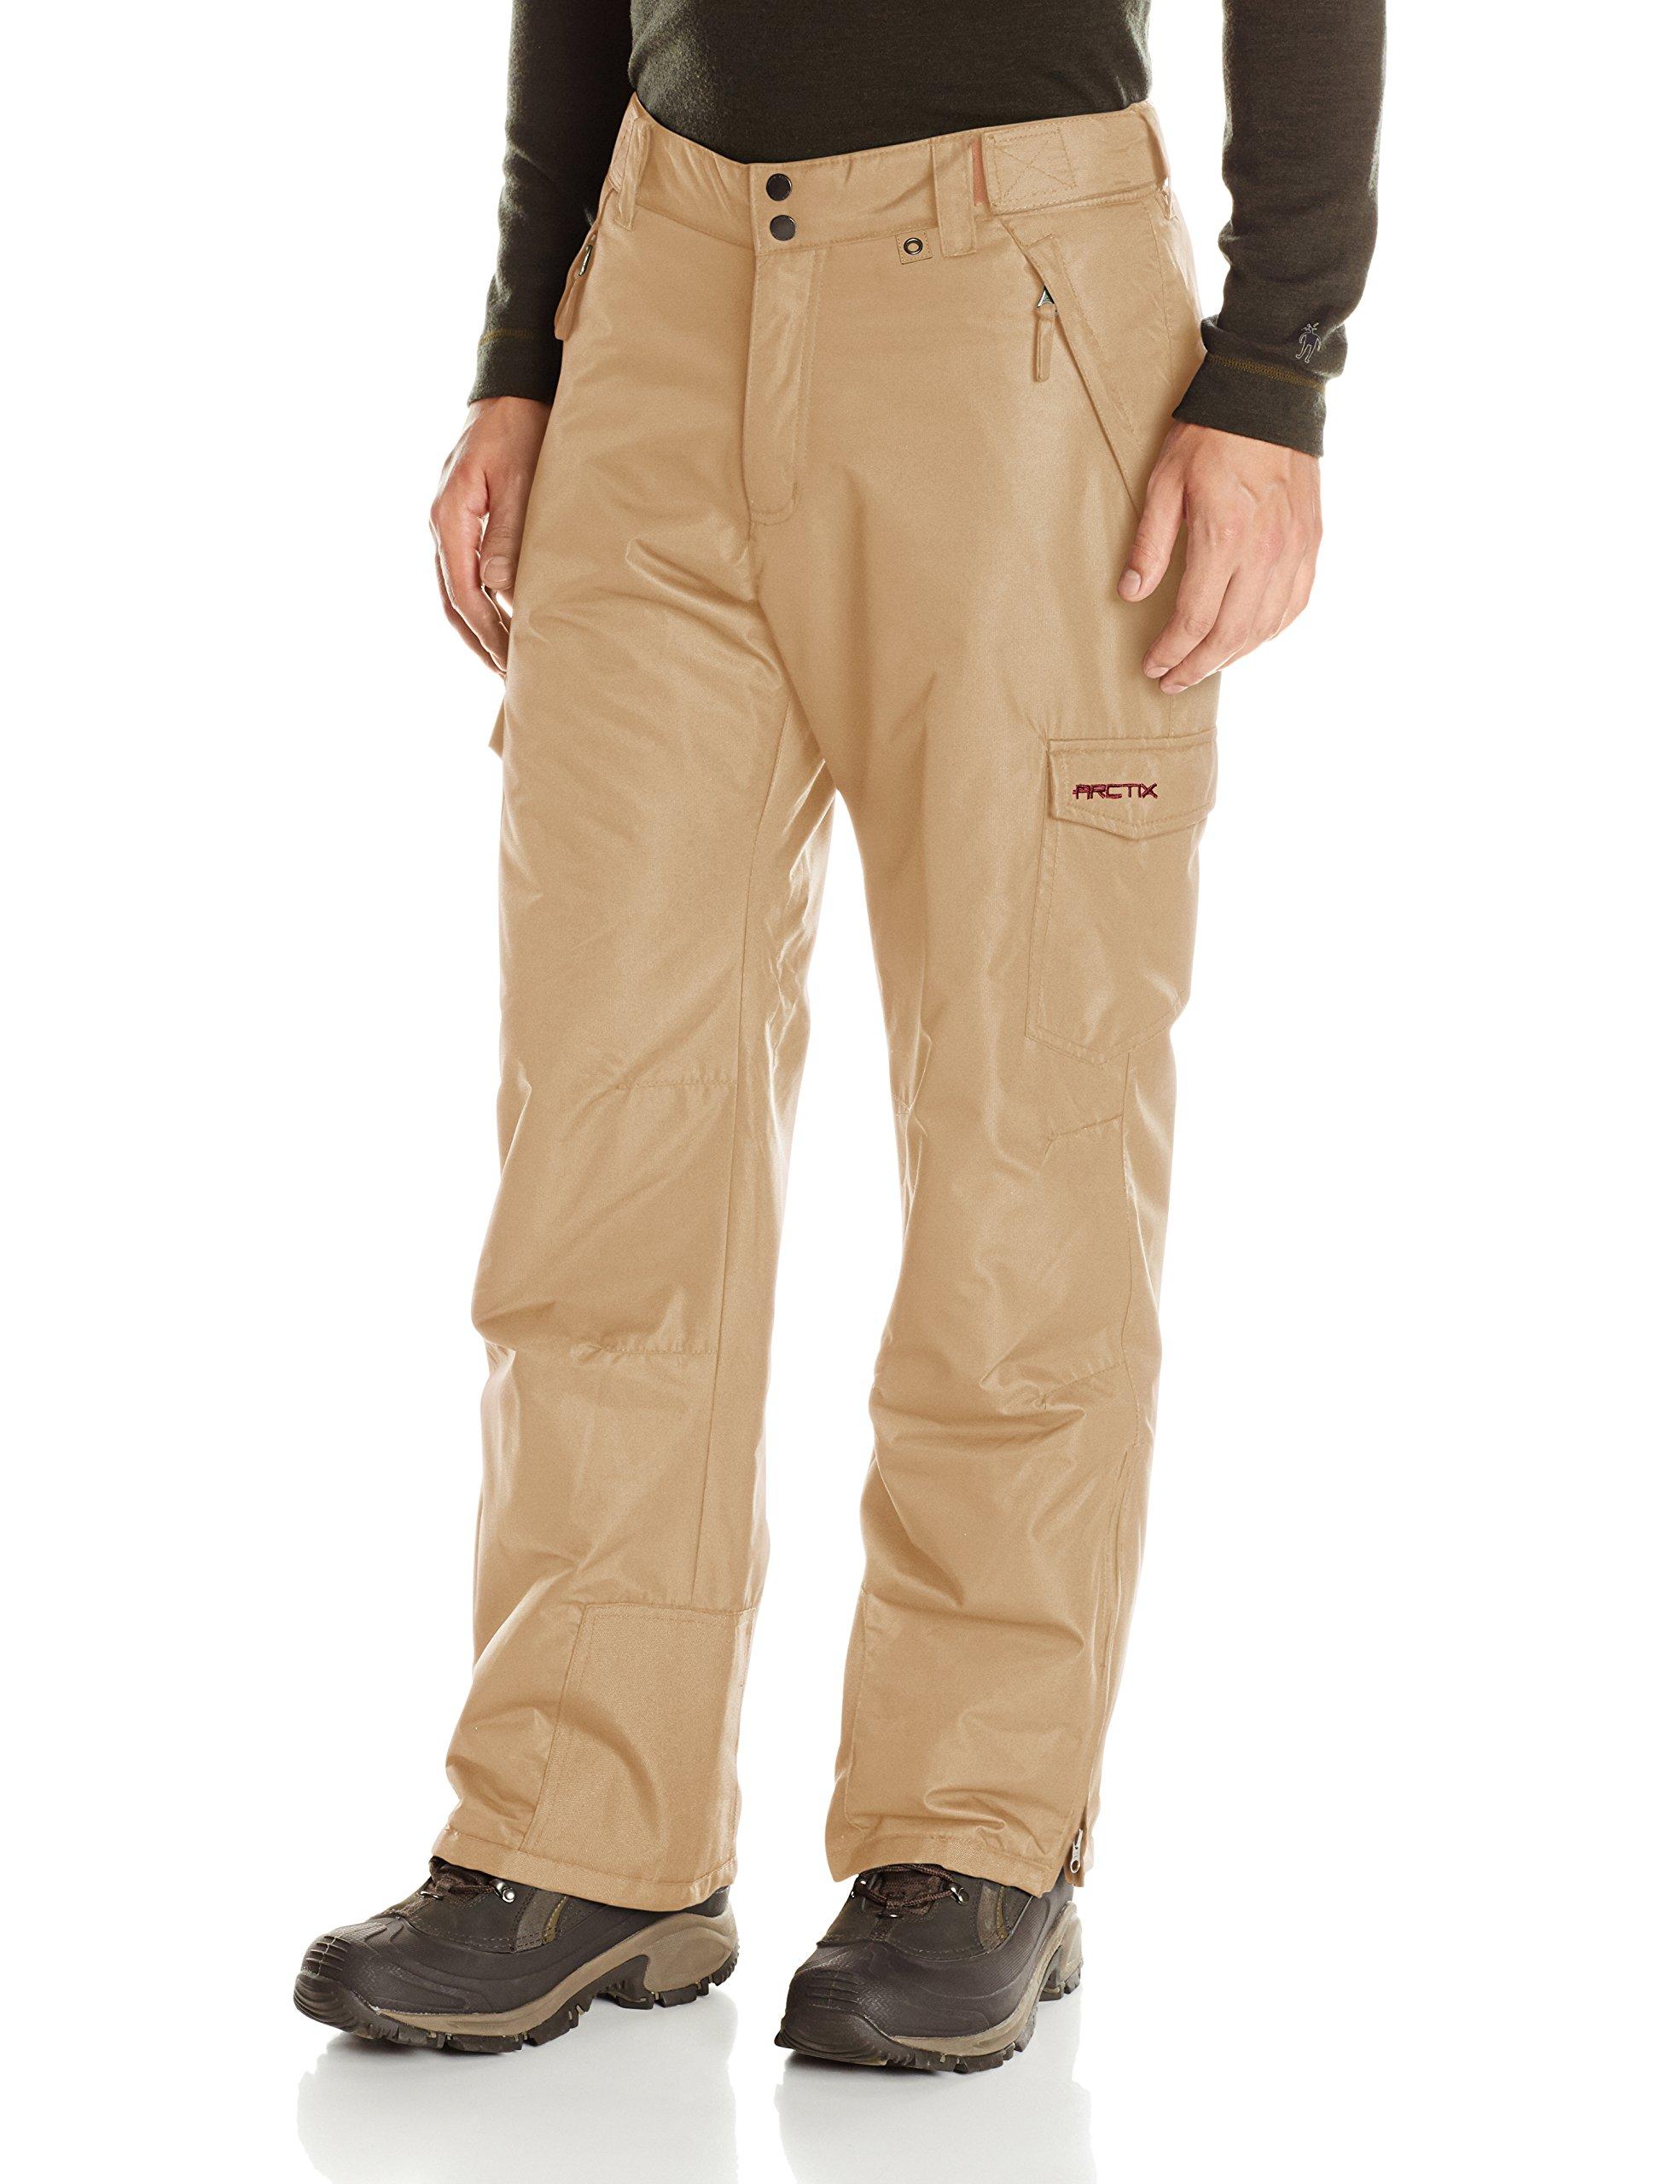 Arctix Men's Snow Sports Cargo Pants, Khaki, Medium/Regular by Arctix